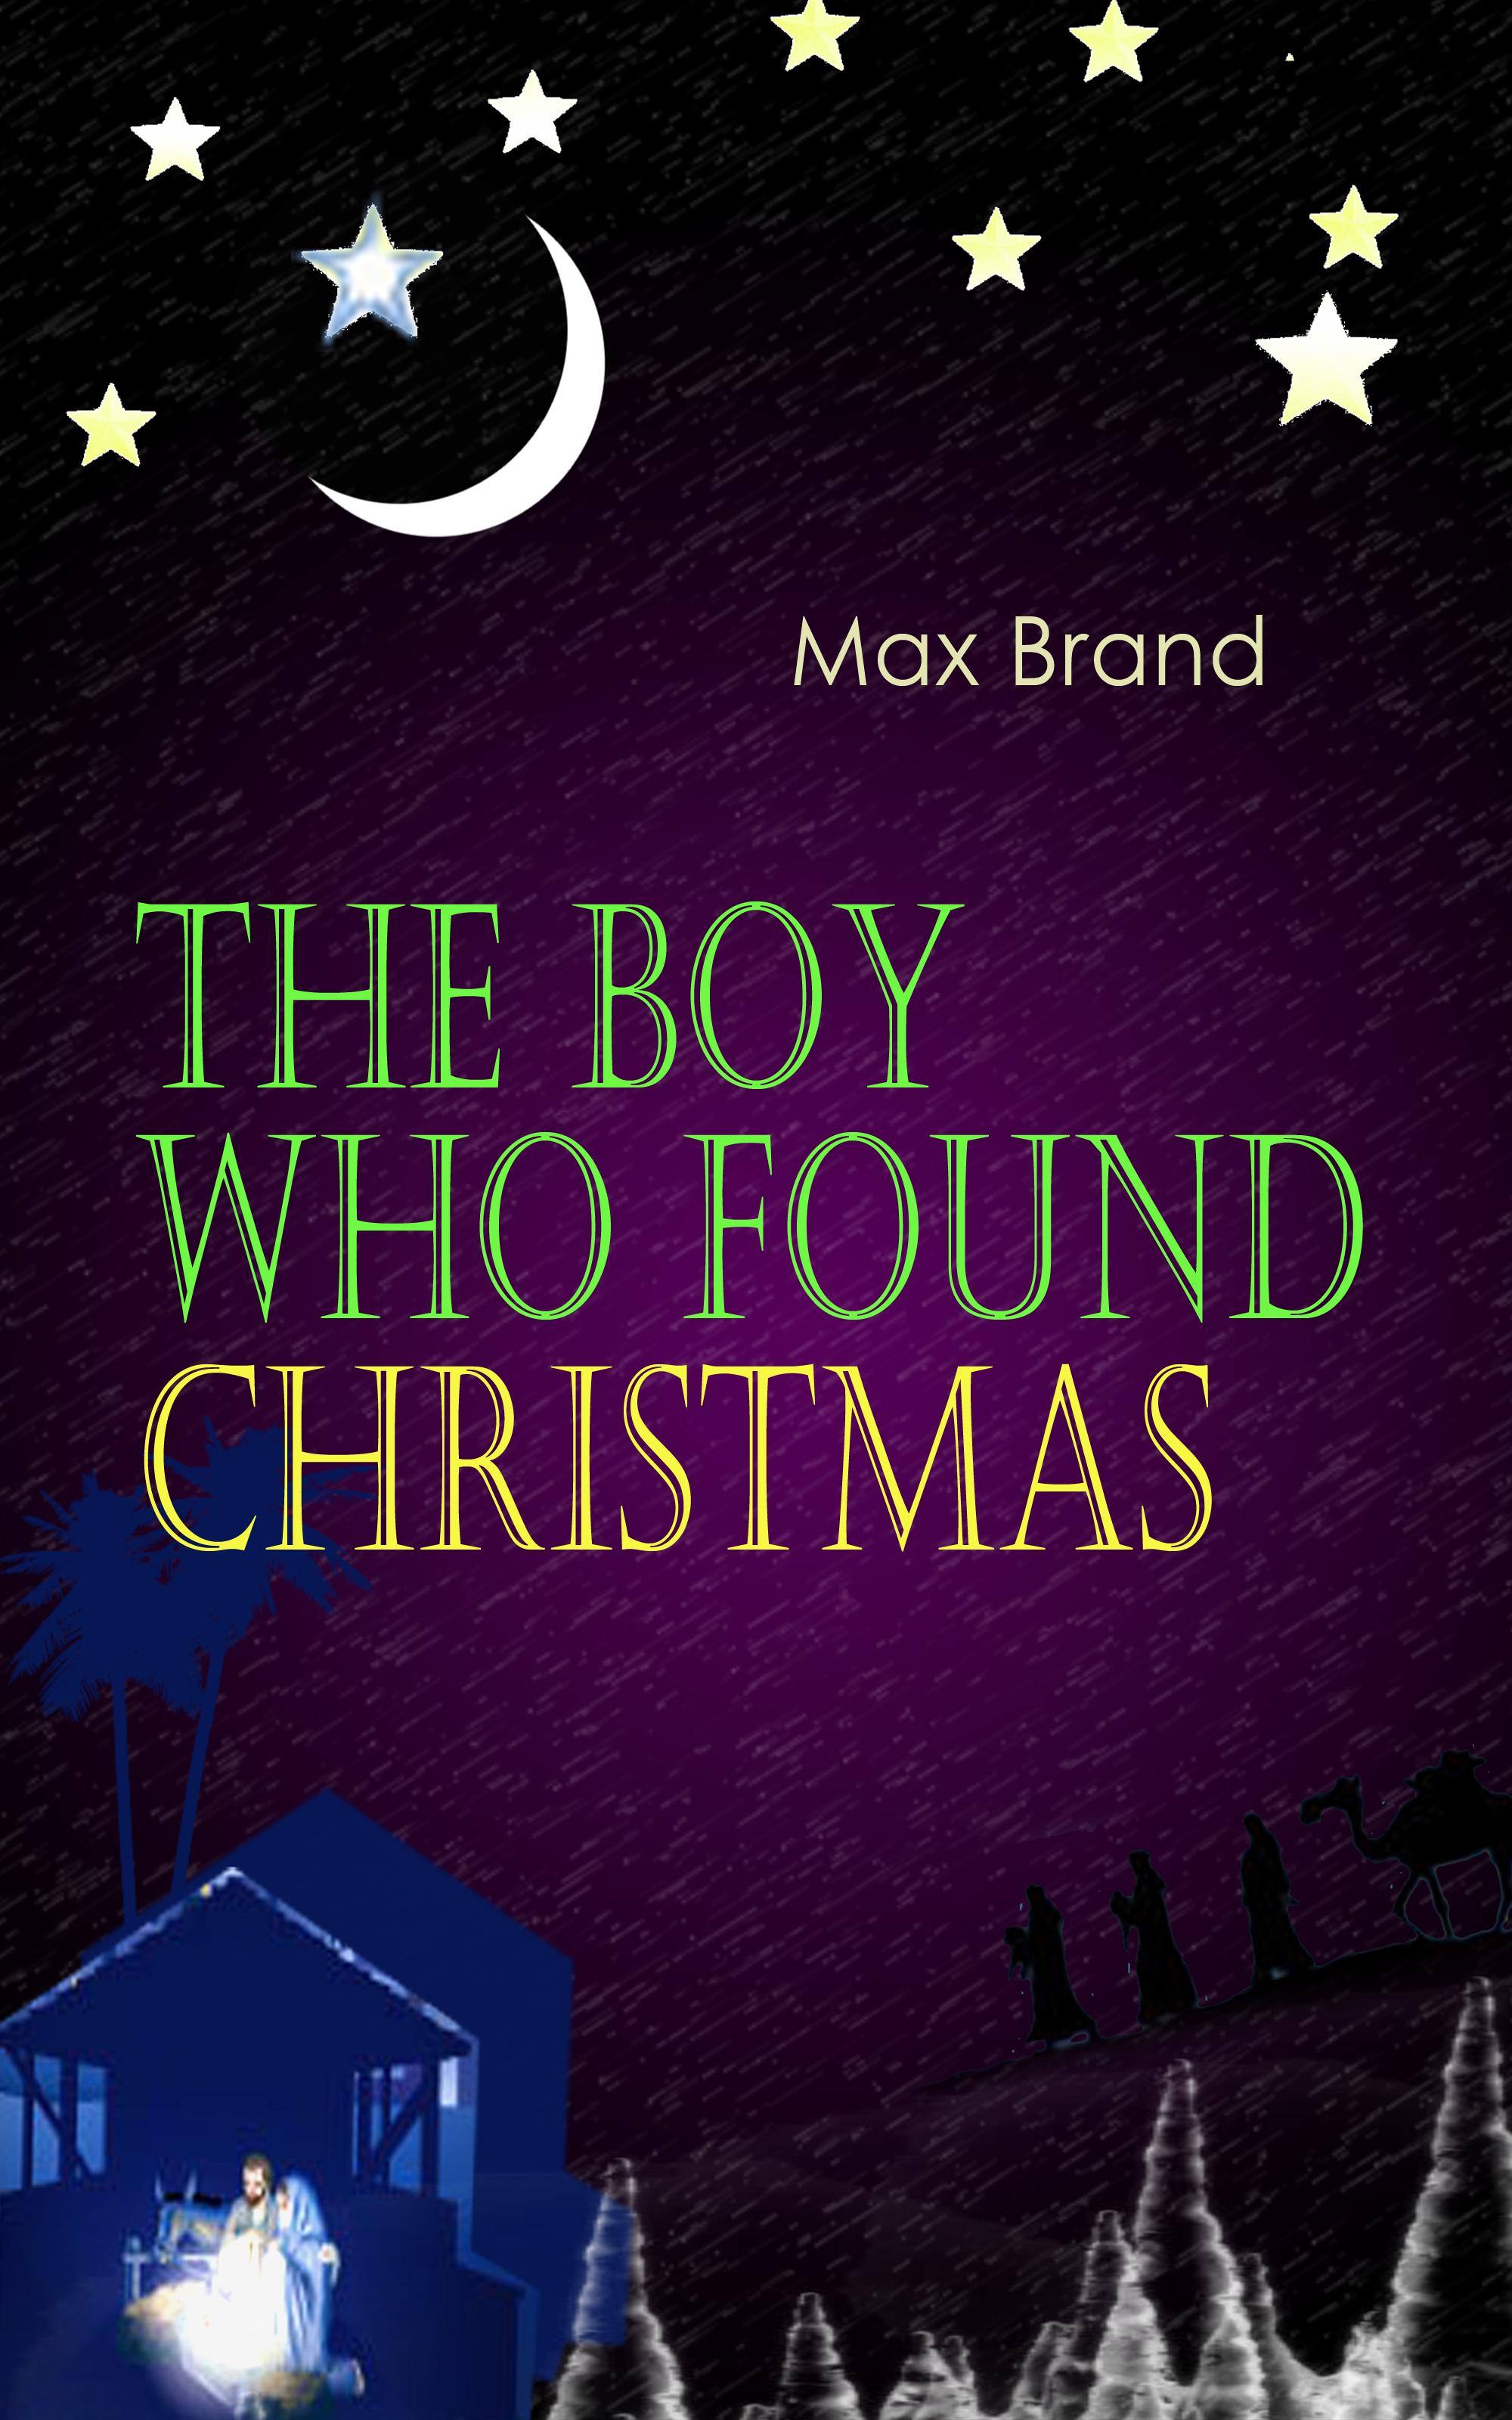 The Boy Who Found Christmas